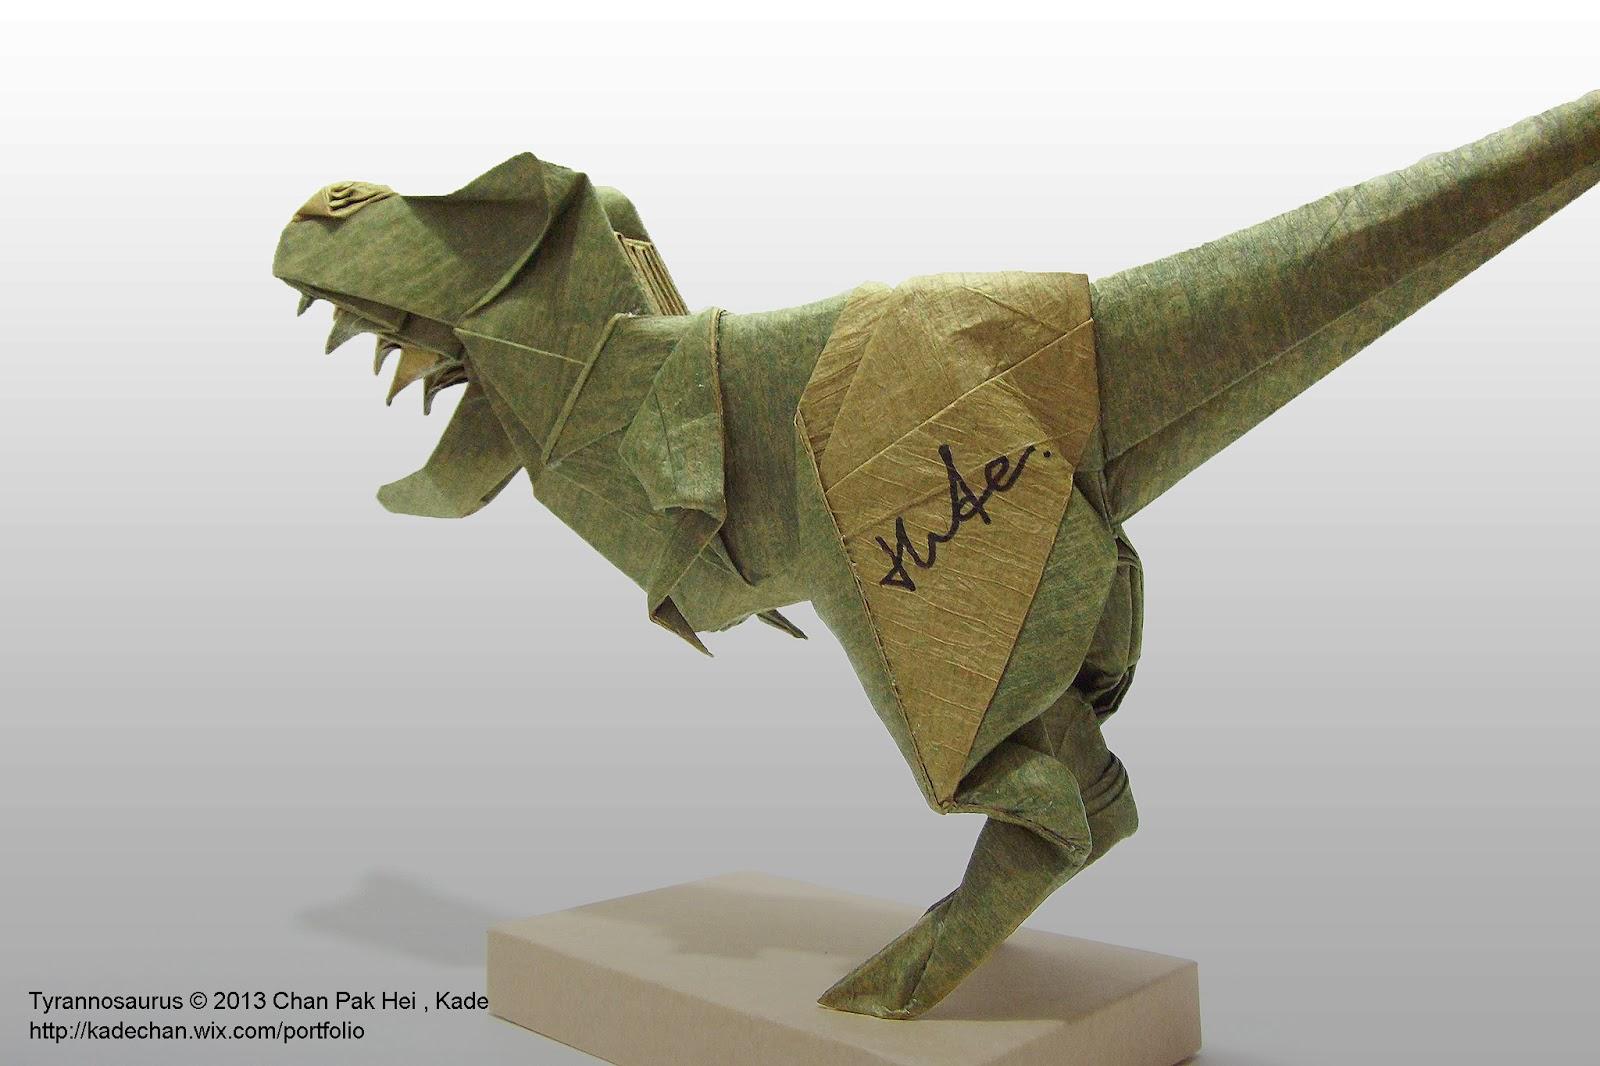 Origami T-Rex Dinosaur by Maekawa Jun - Yakomoga Origami tutorial ... | 1066x1600